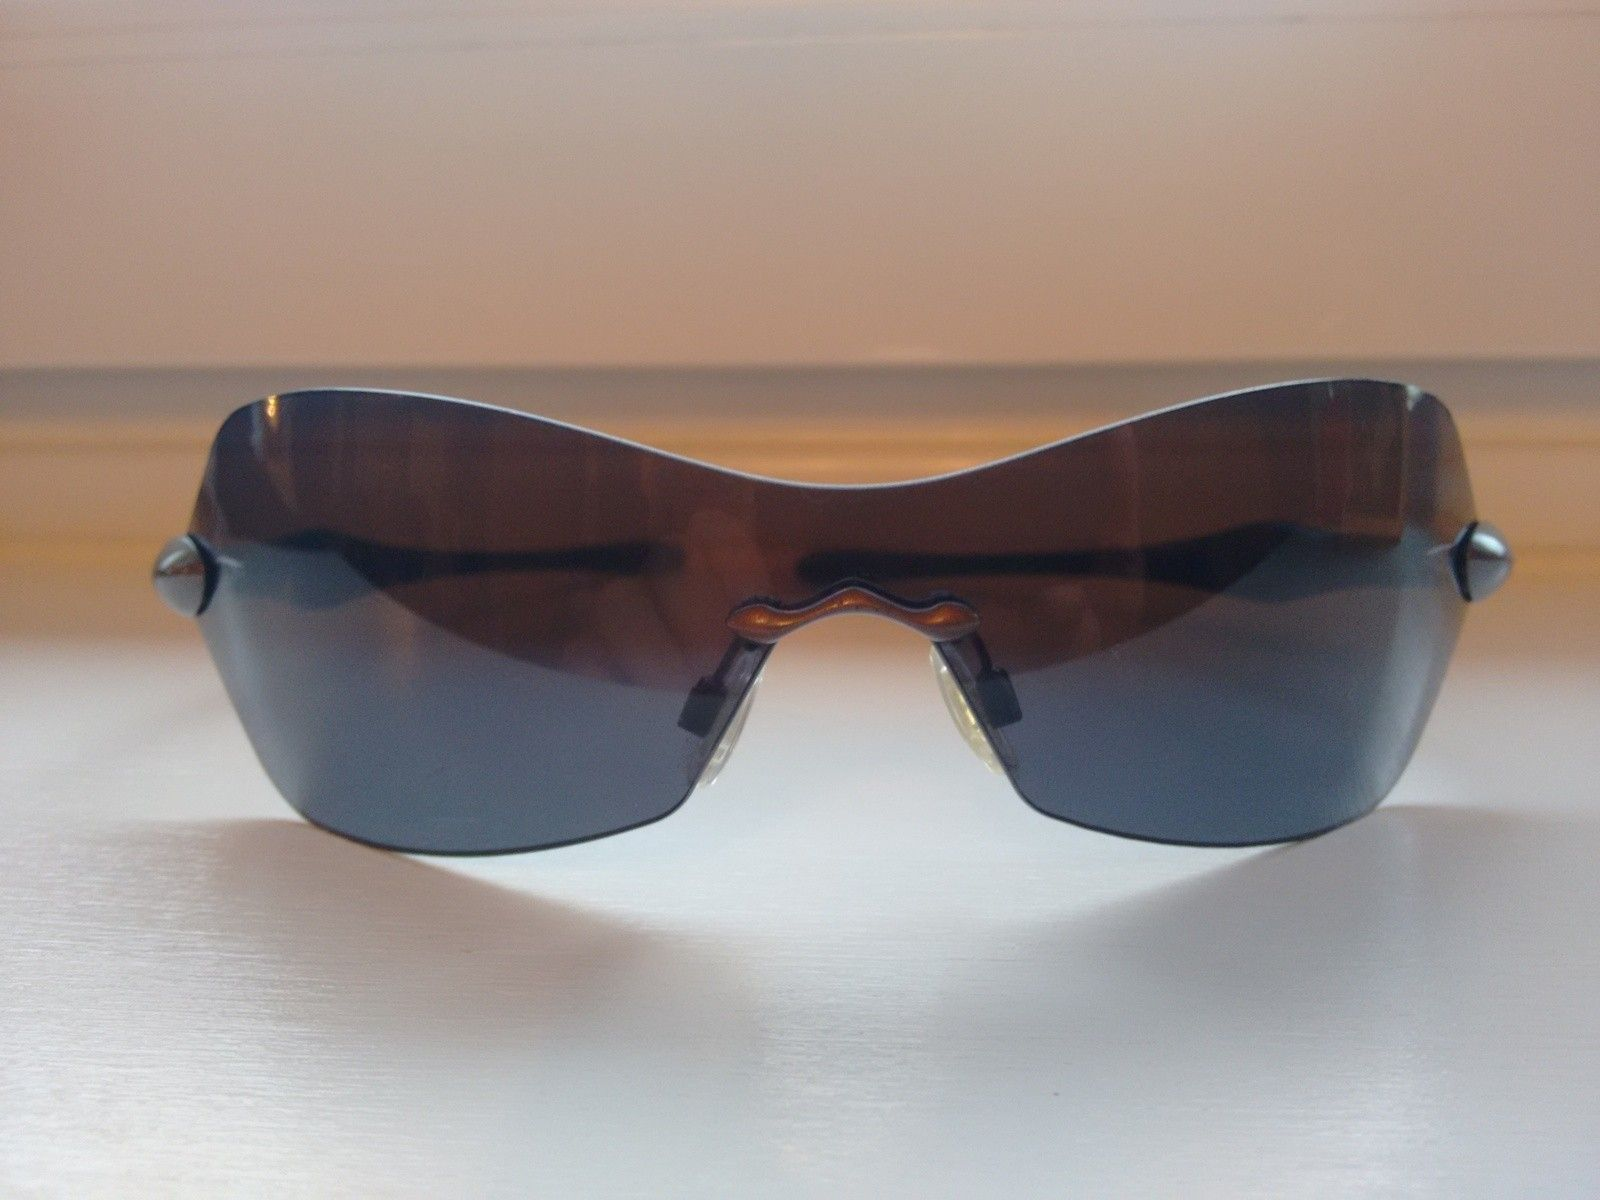 Dartboard, night camo/grey lens U.K salesale - IMG_20150608_202416768.jpg